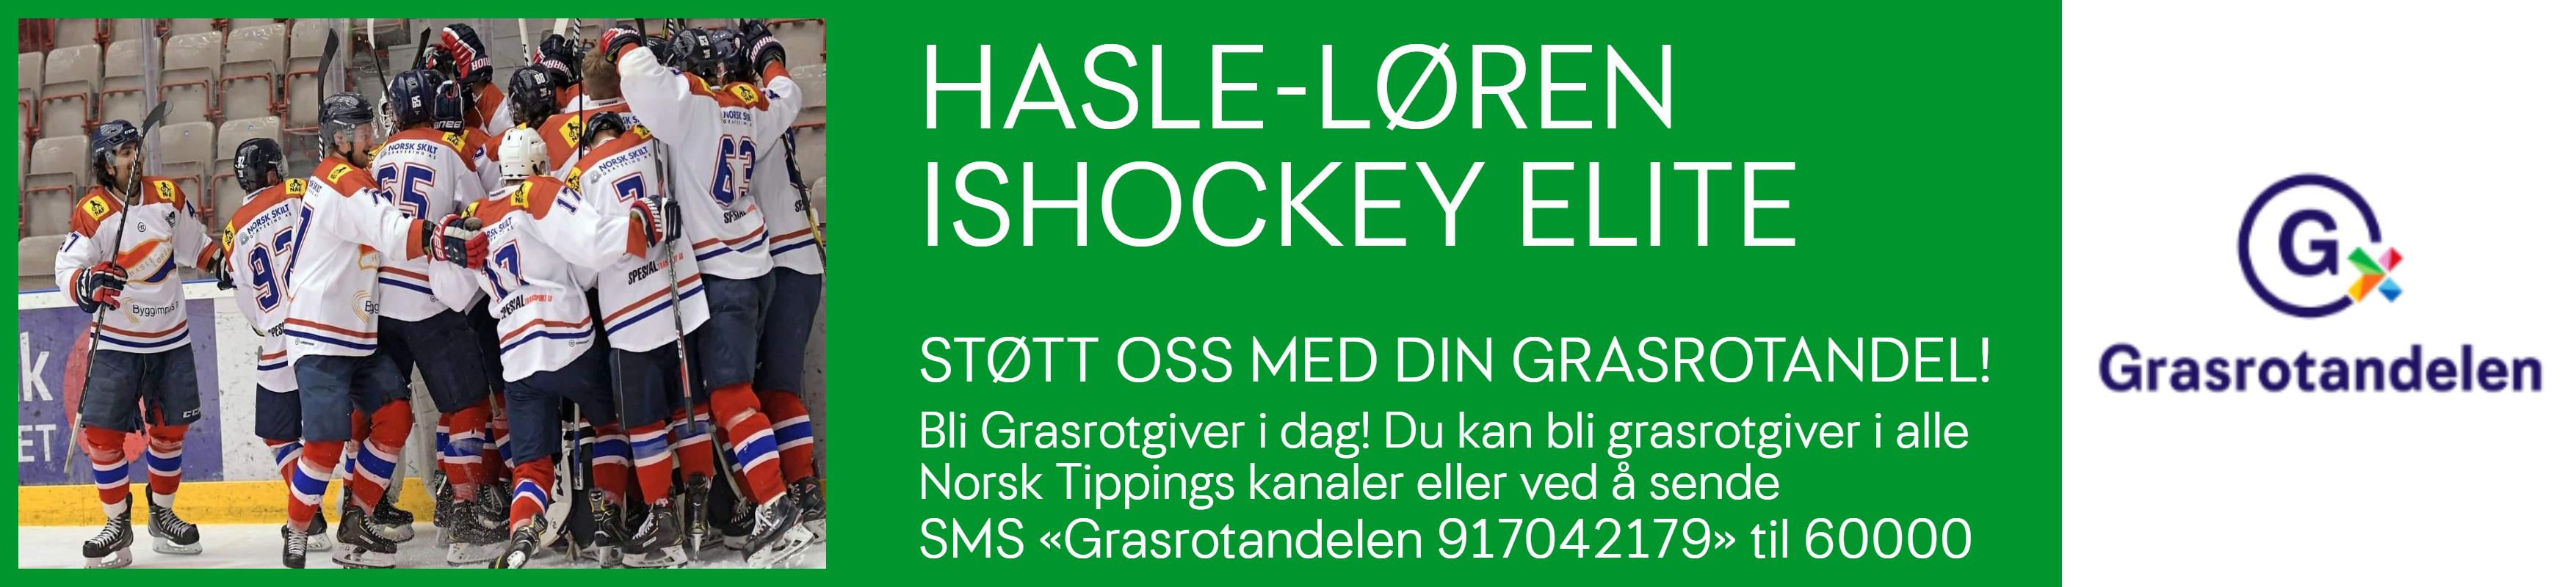 nimble_asset_Grasrot-Plakat-Liggende